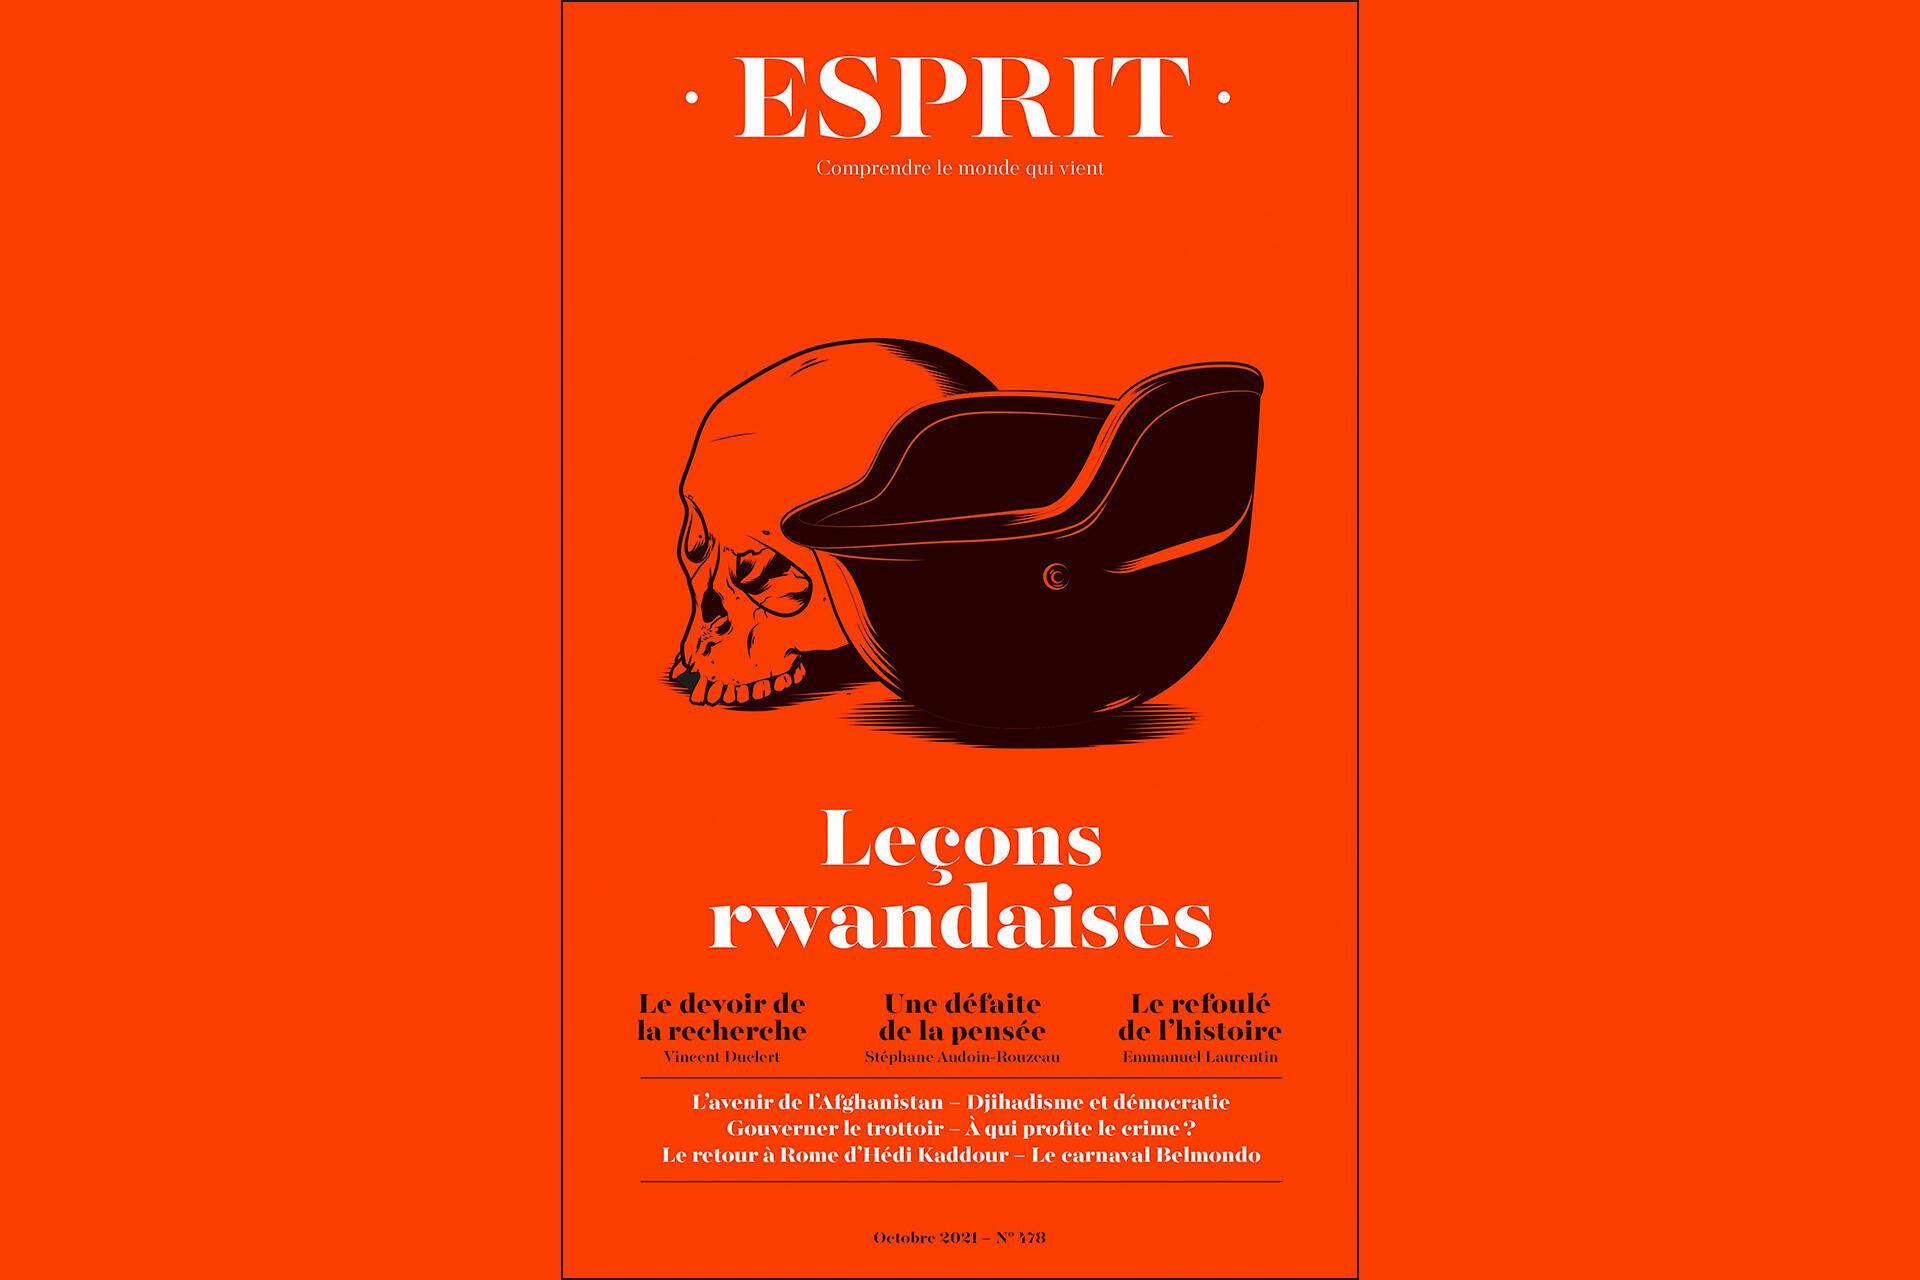 Revue-Esprit-dossier-Rwanda